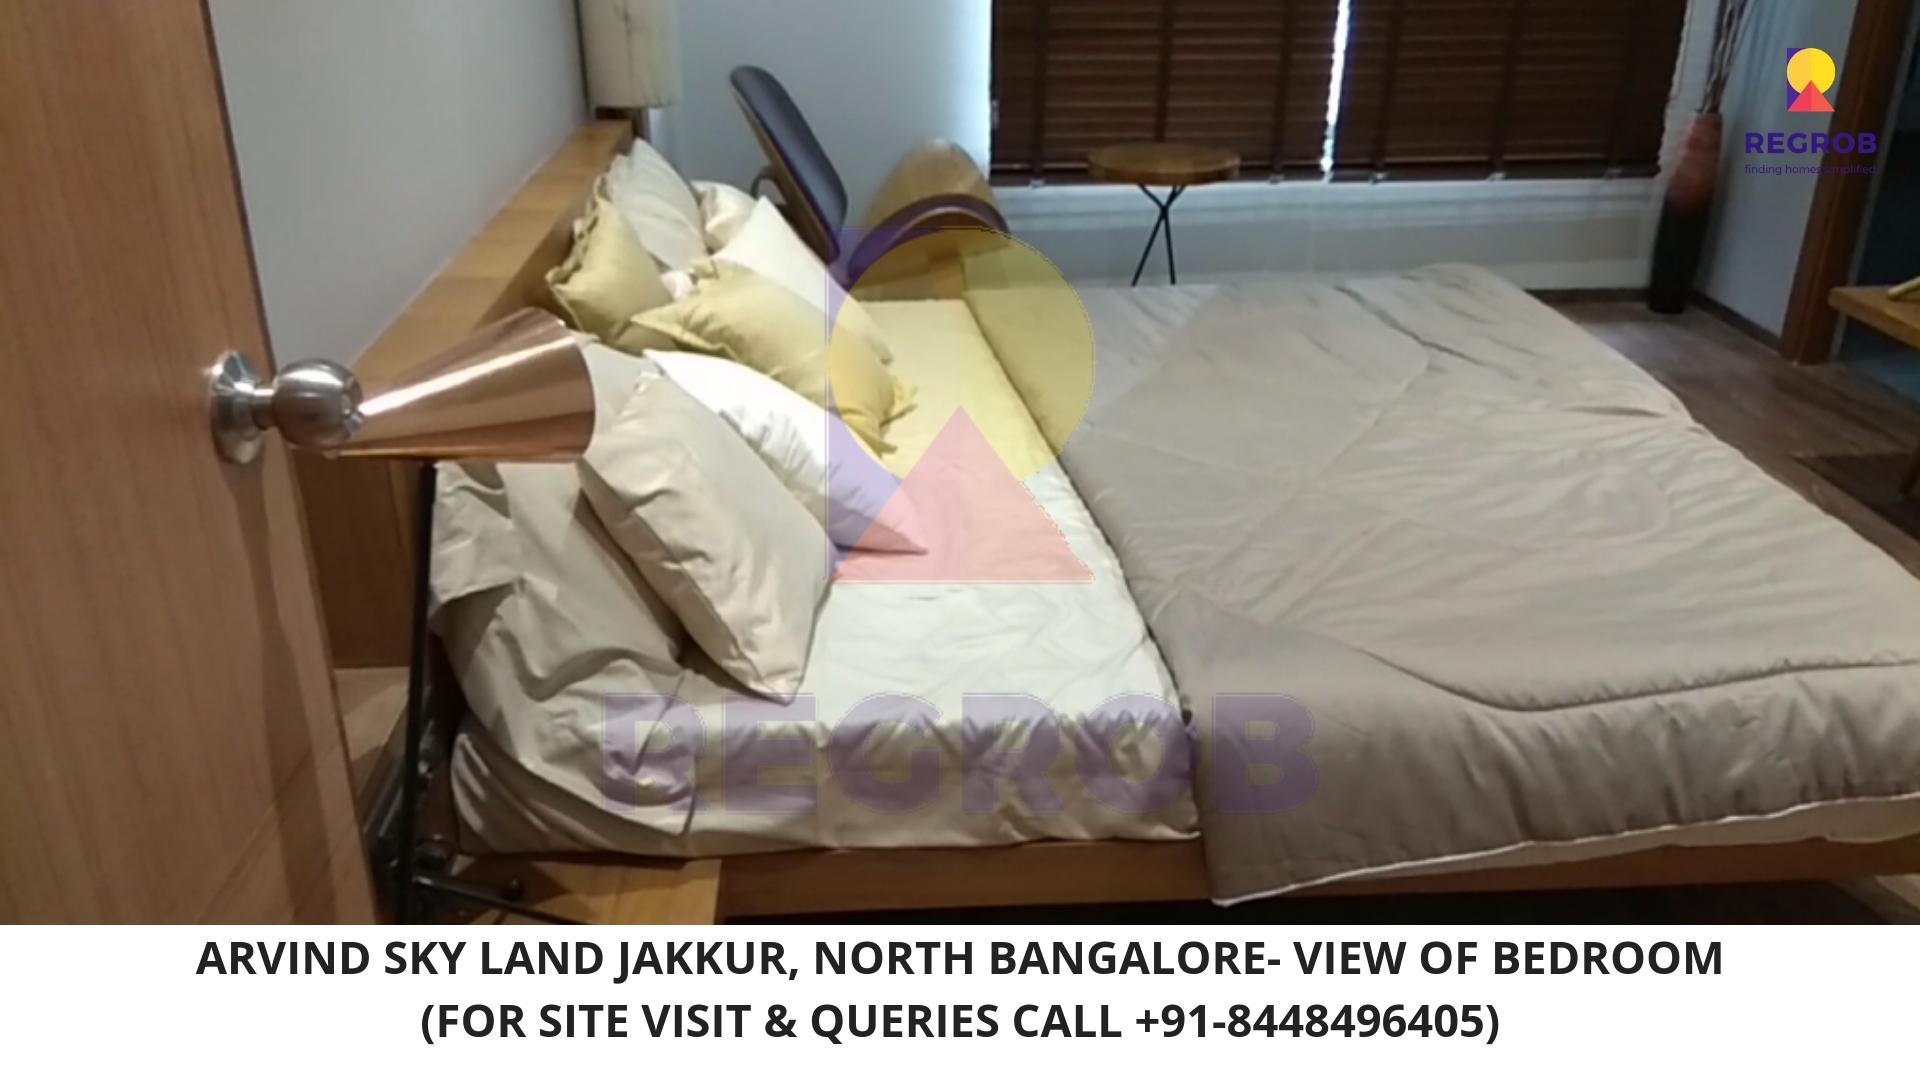 Arvind Skylands Jakkur North Bangalore